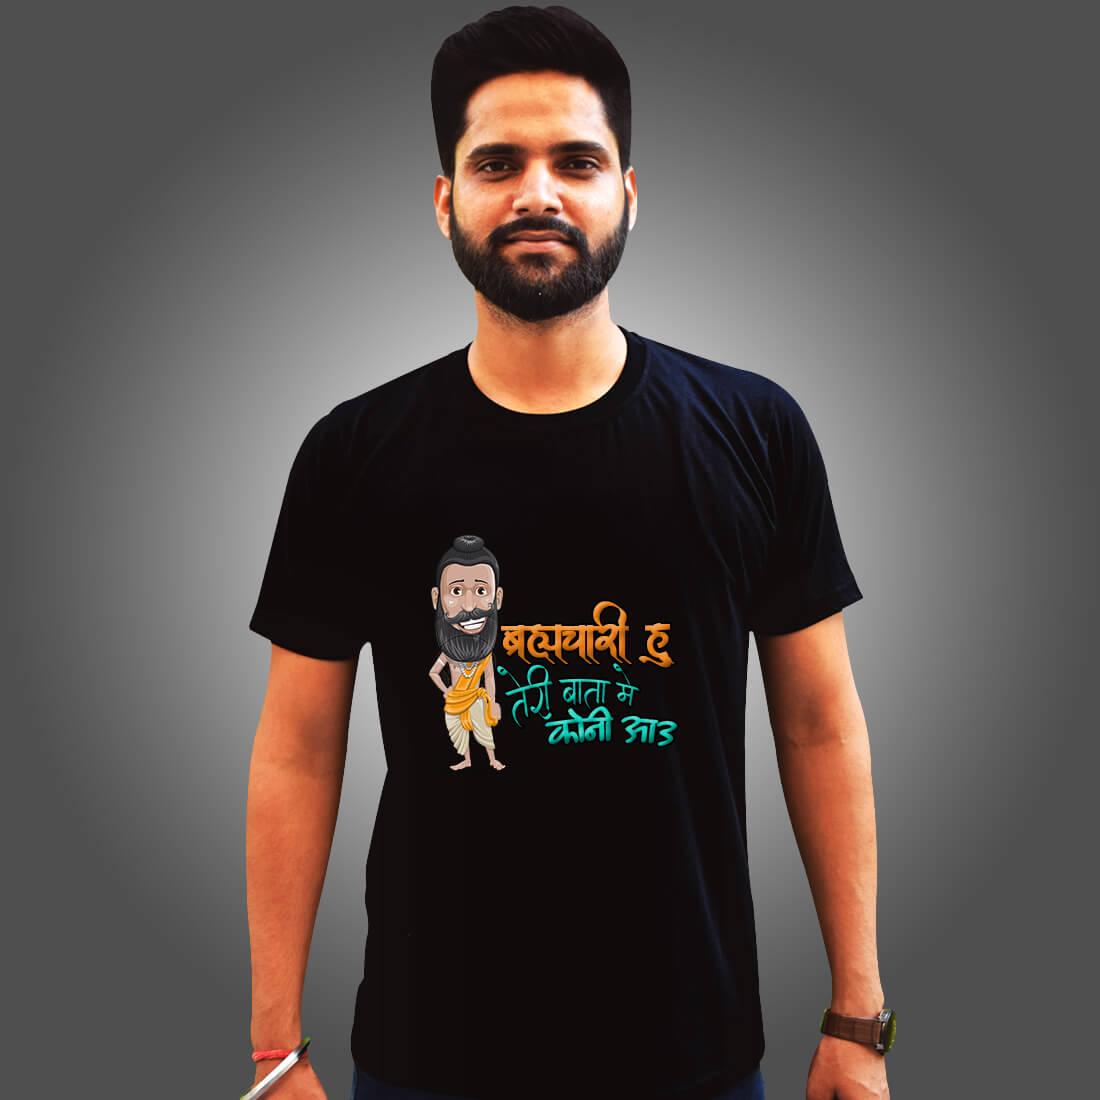 Brahmchari Quotes Printed Plain Black T Shirt